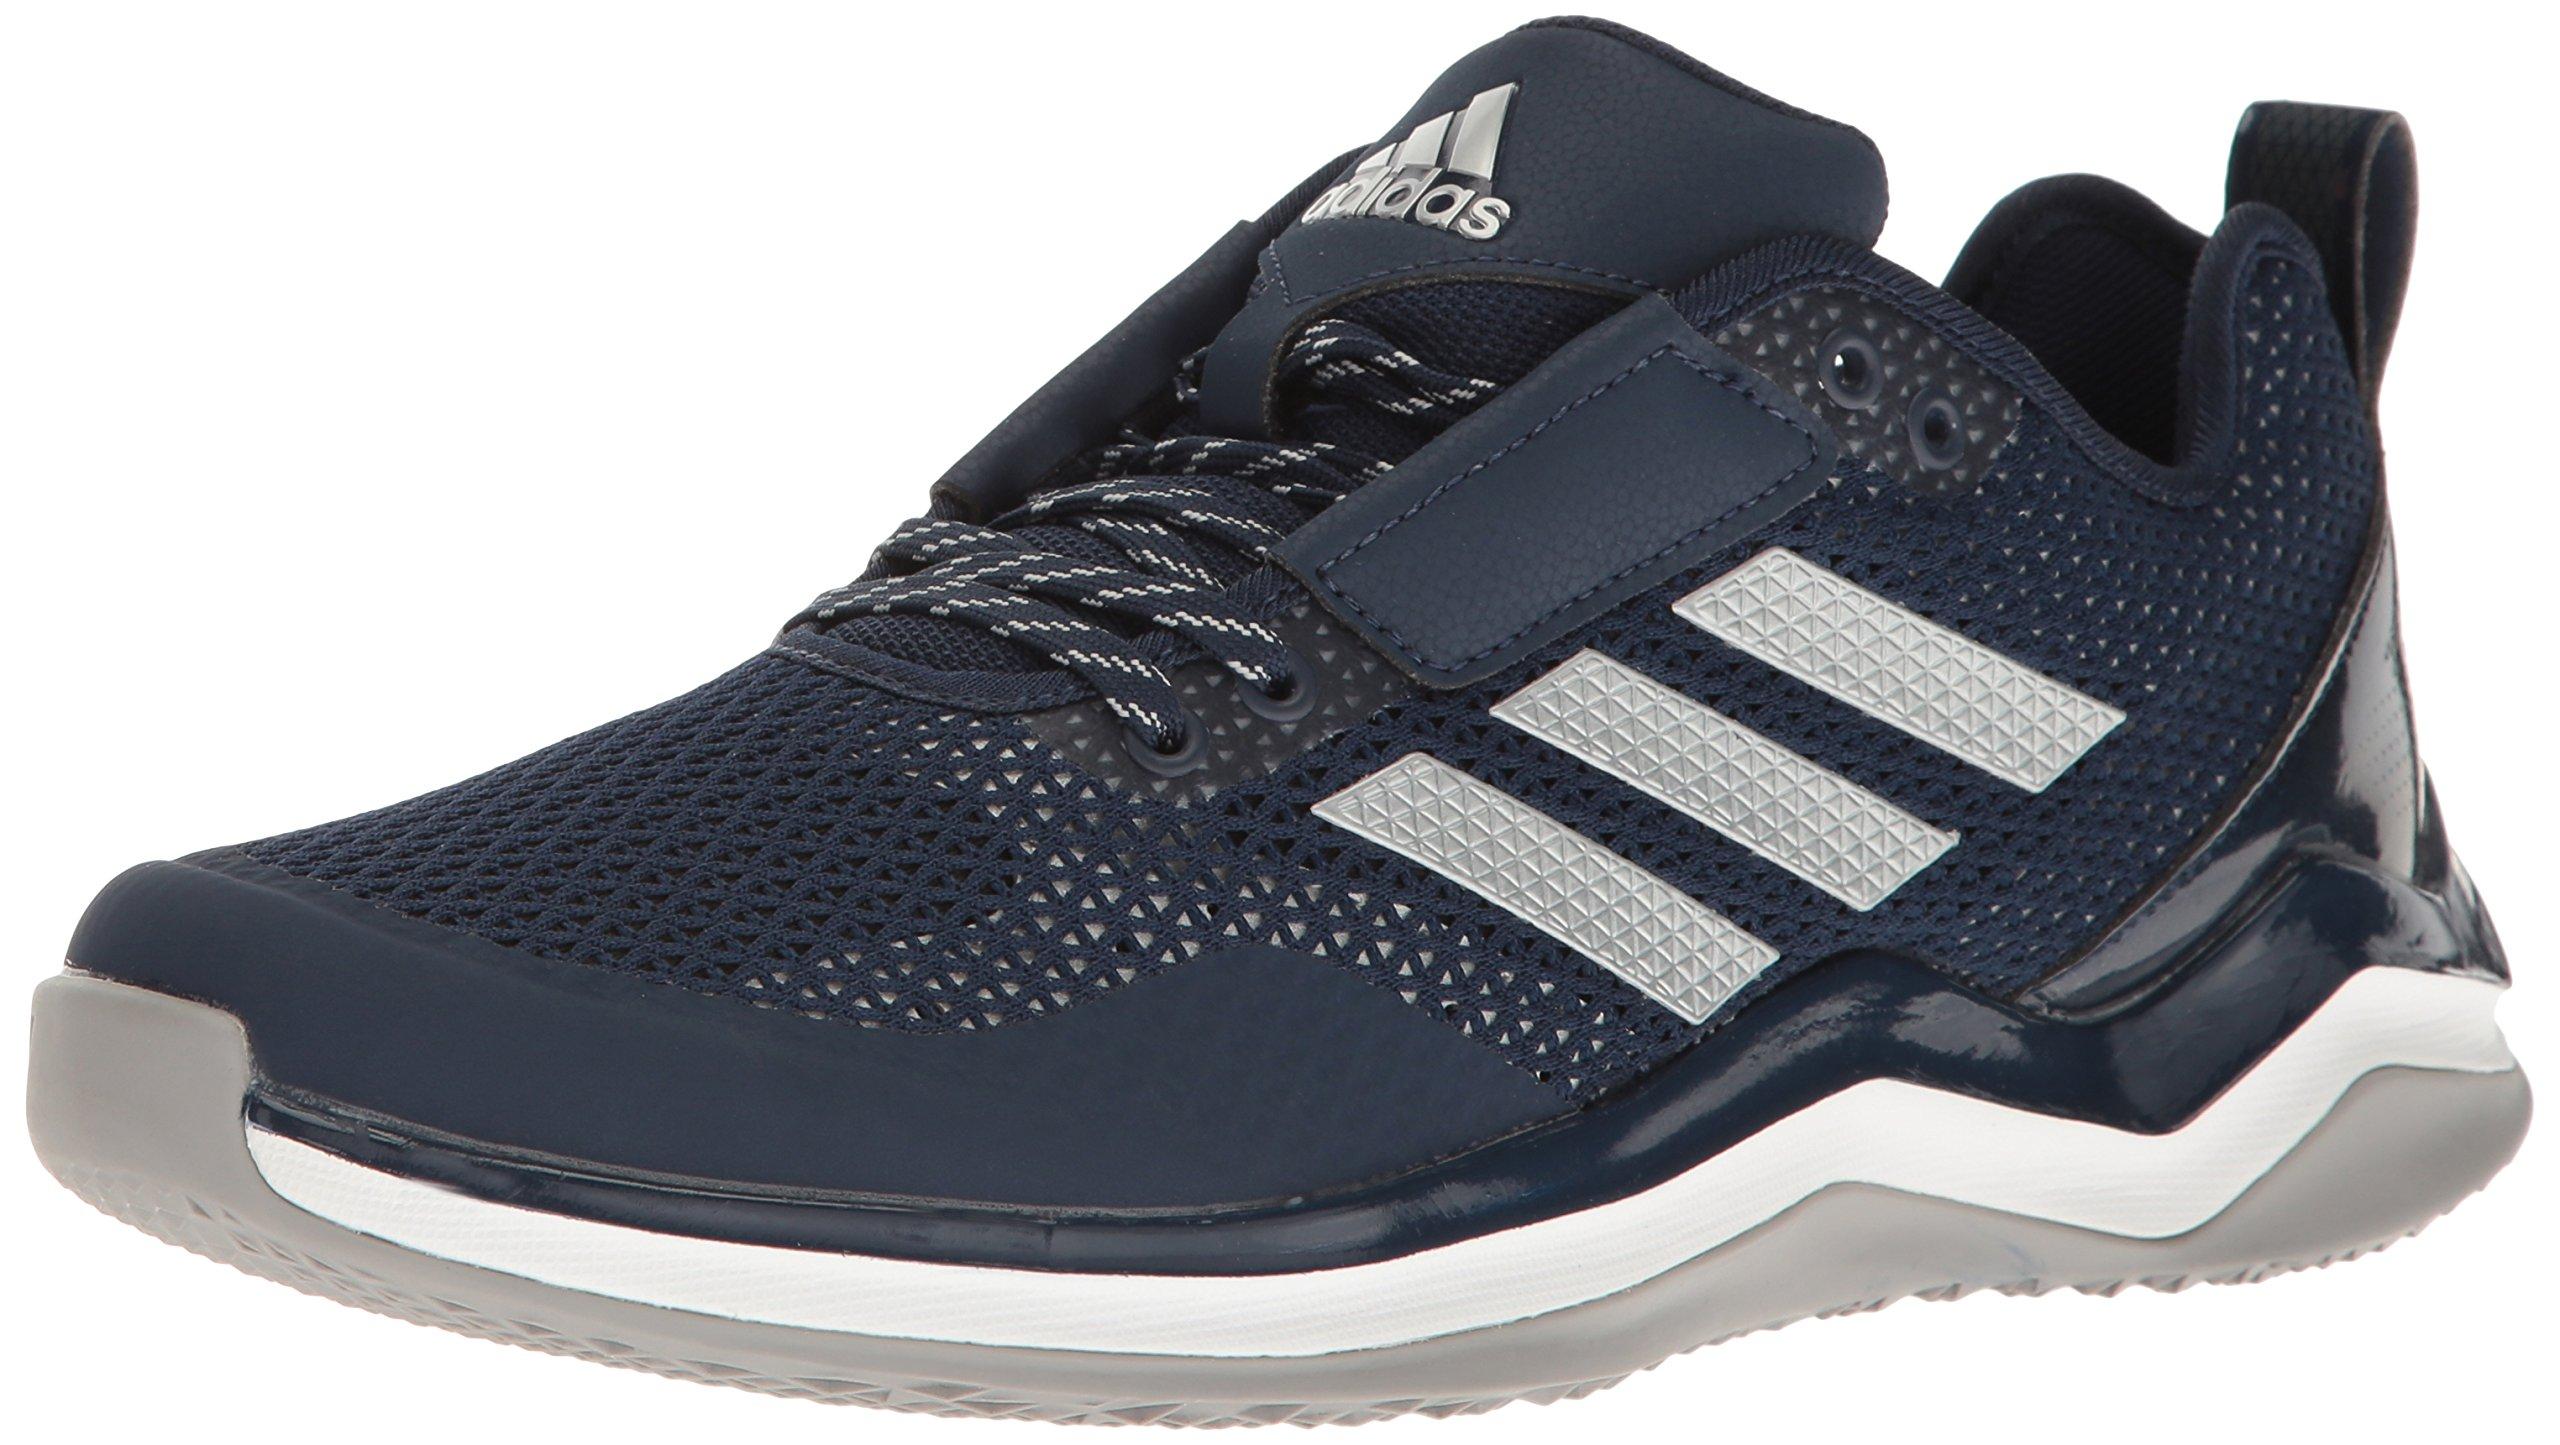 adidas Performance Men's Speed 3.0 Cross-Trainer Shoes, Collegiate Navy/Metallic Silver/White, (16 M US)